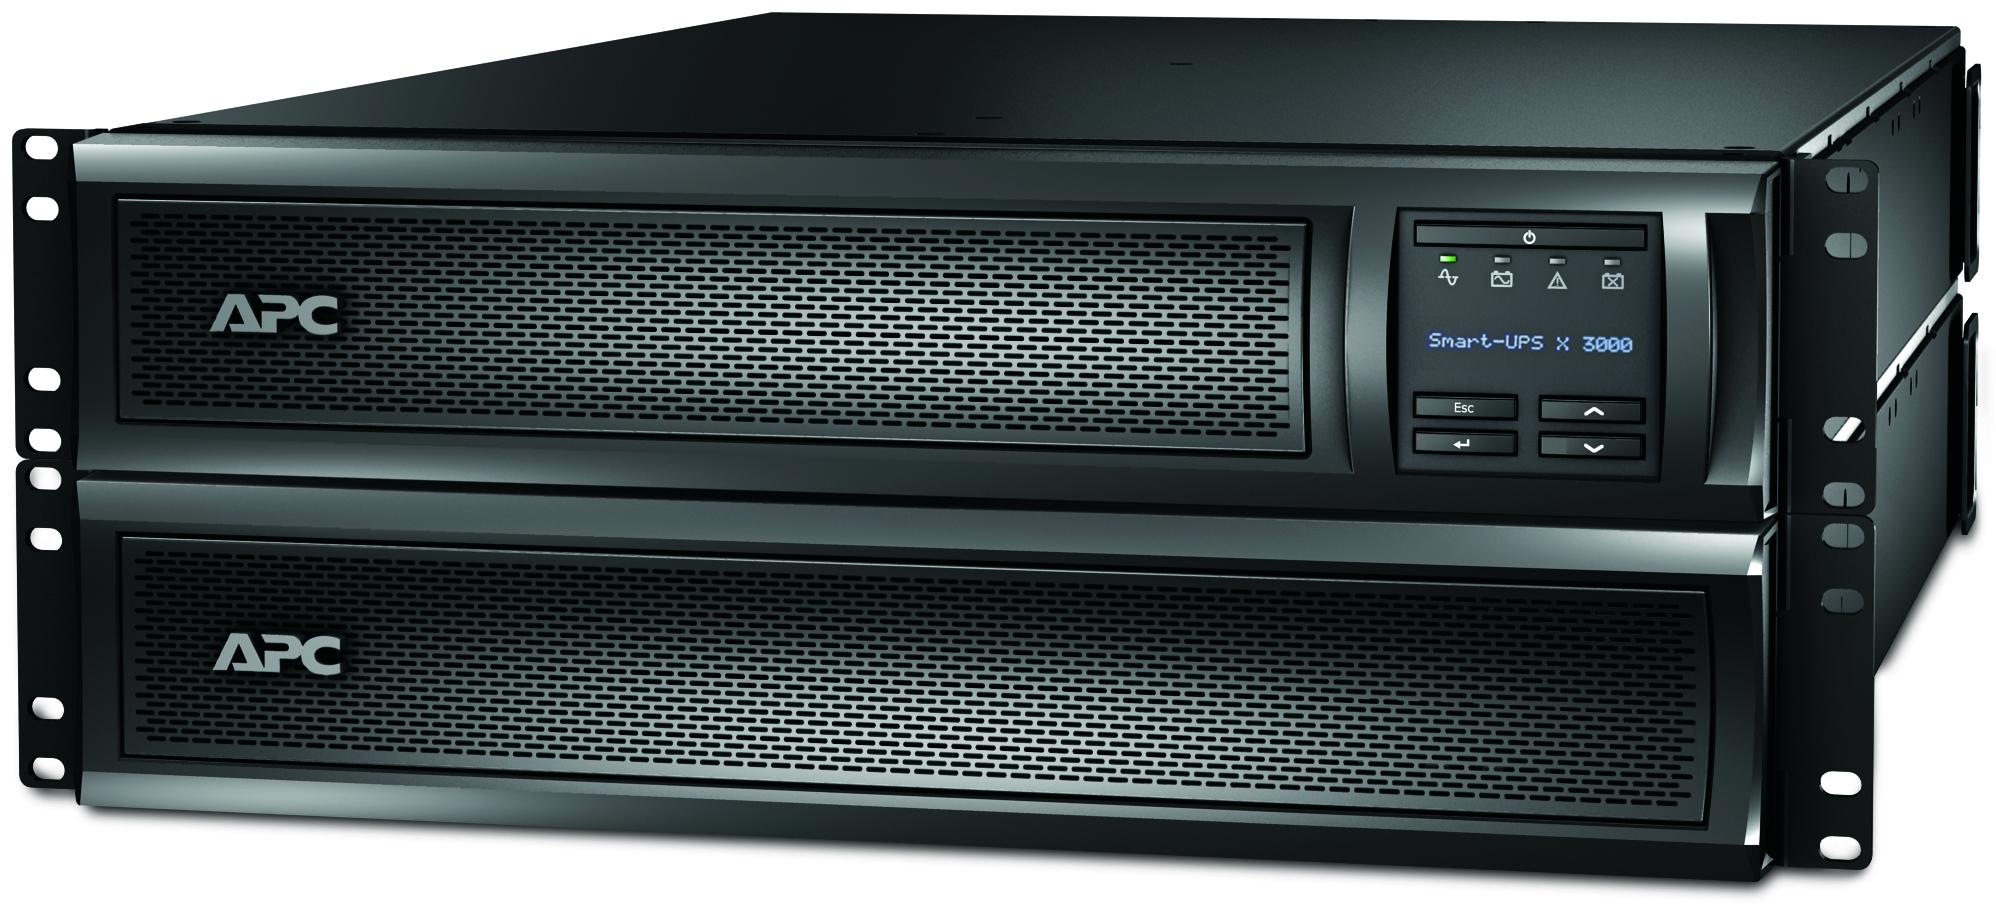 APC-by-Schneider-Electric-SMX3000RMHV2U-SMX120RMBP2U